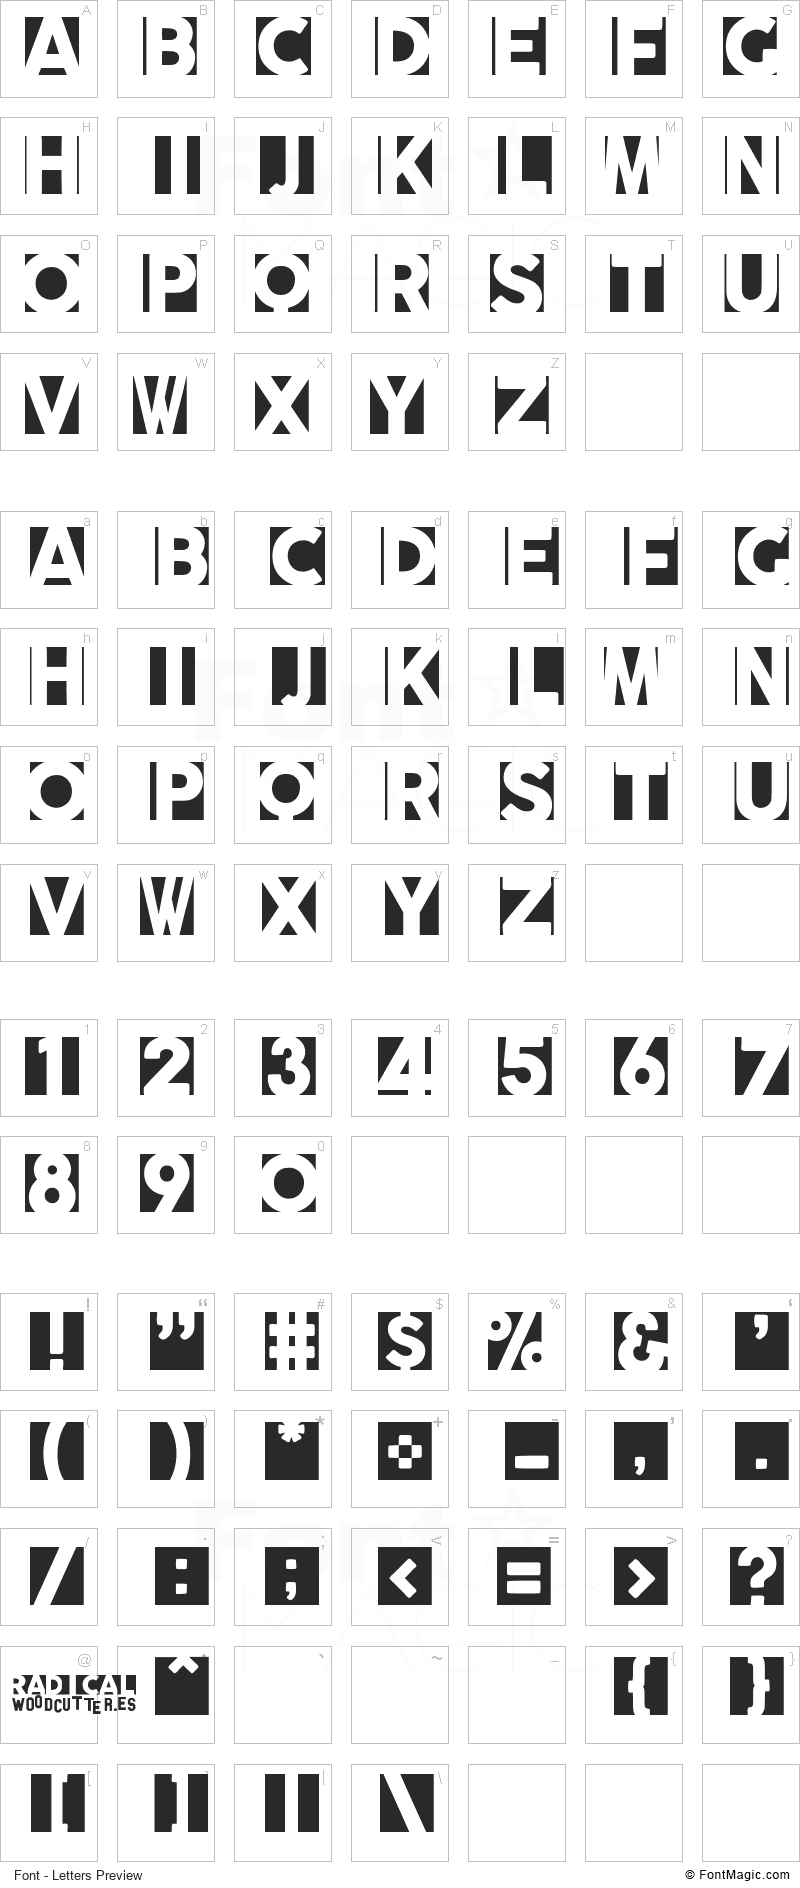 Radicalblock Font - All Latters Preview Chart